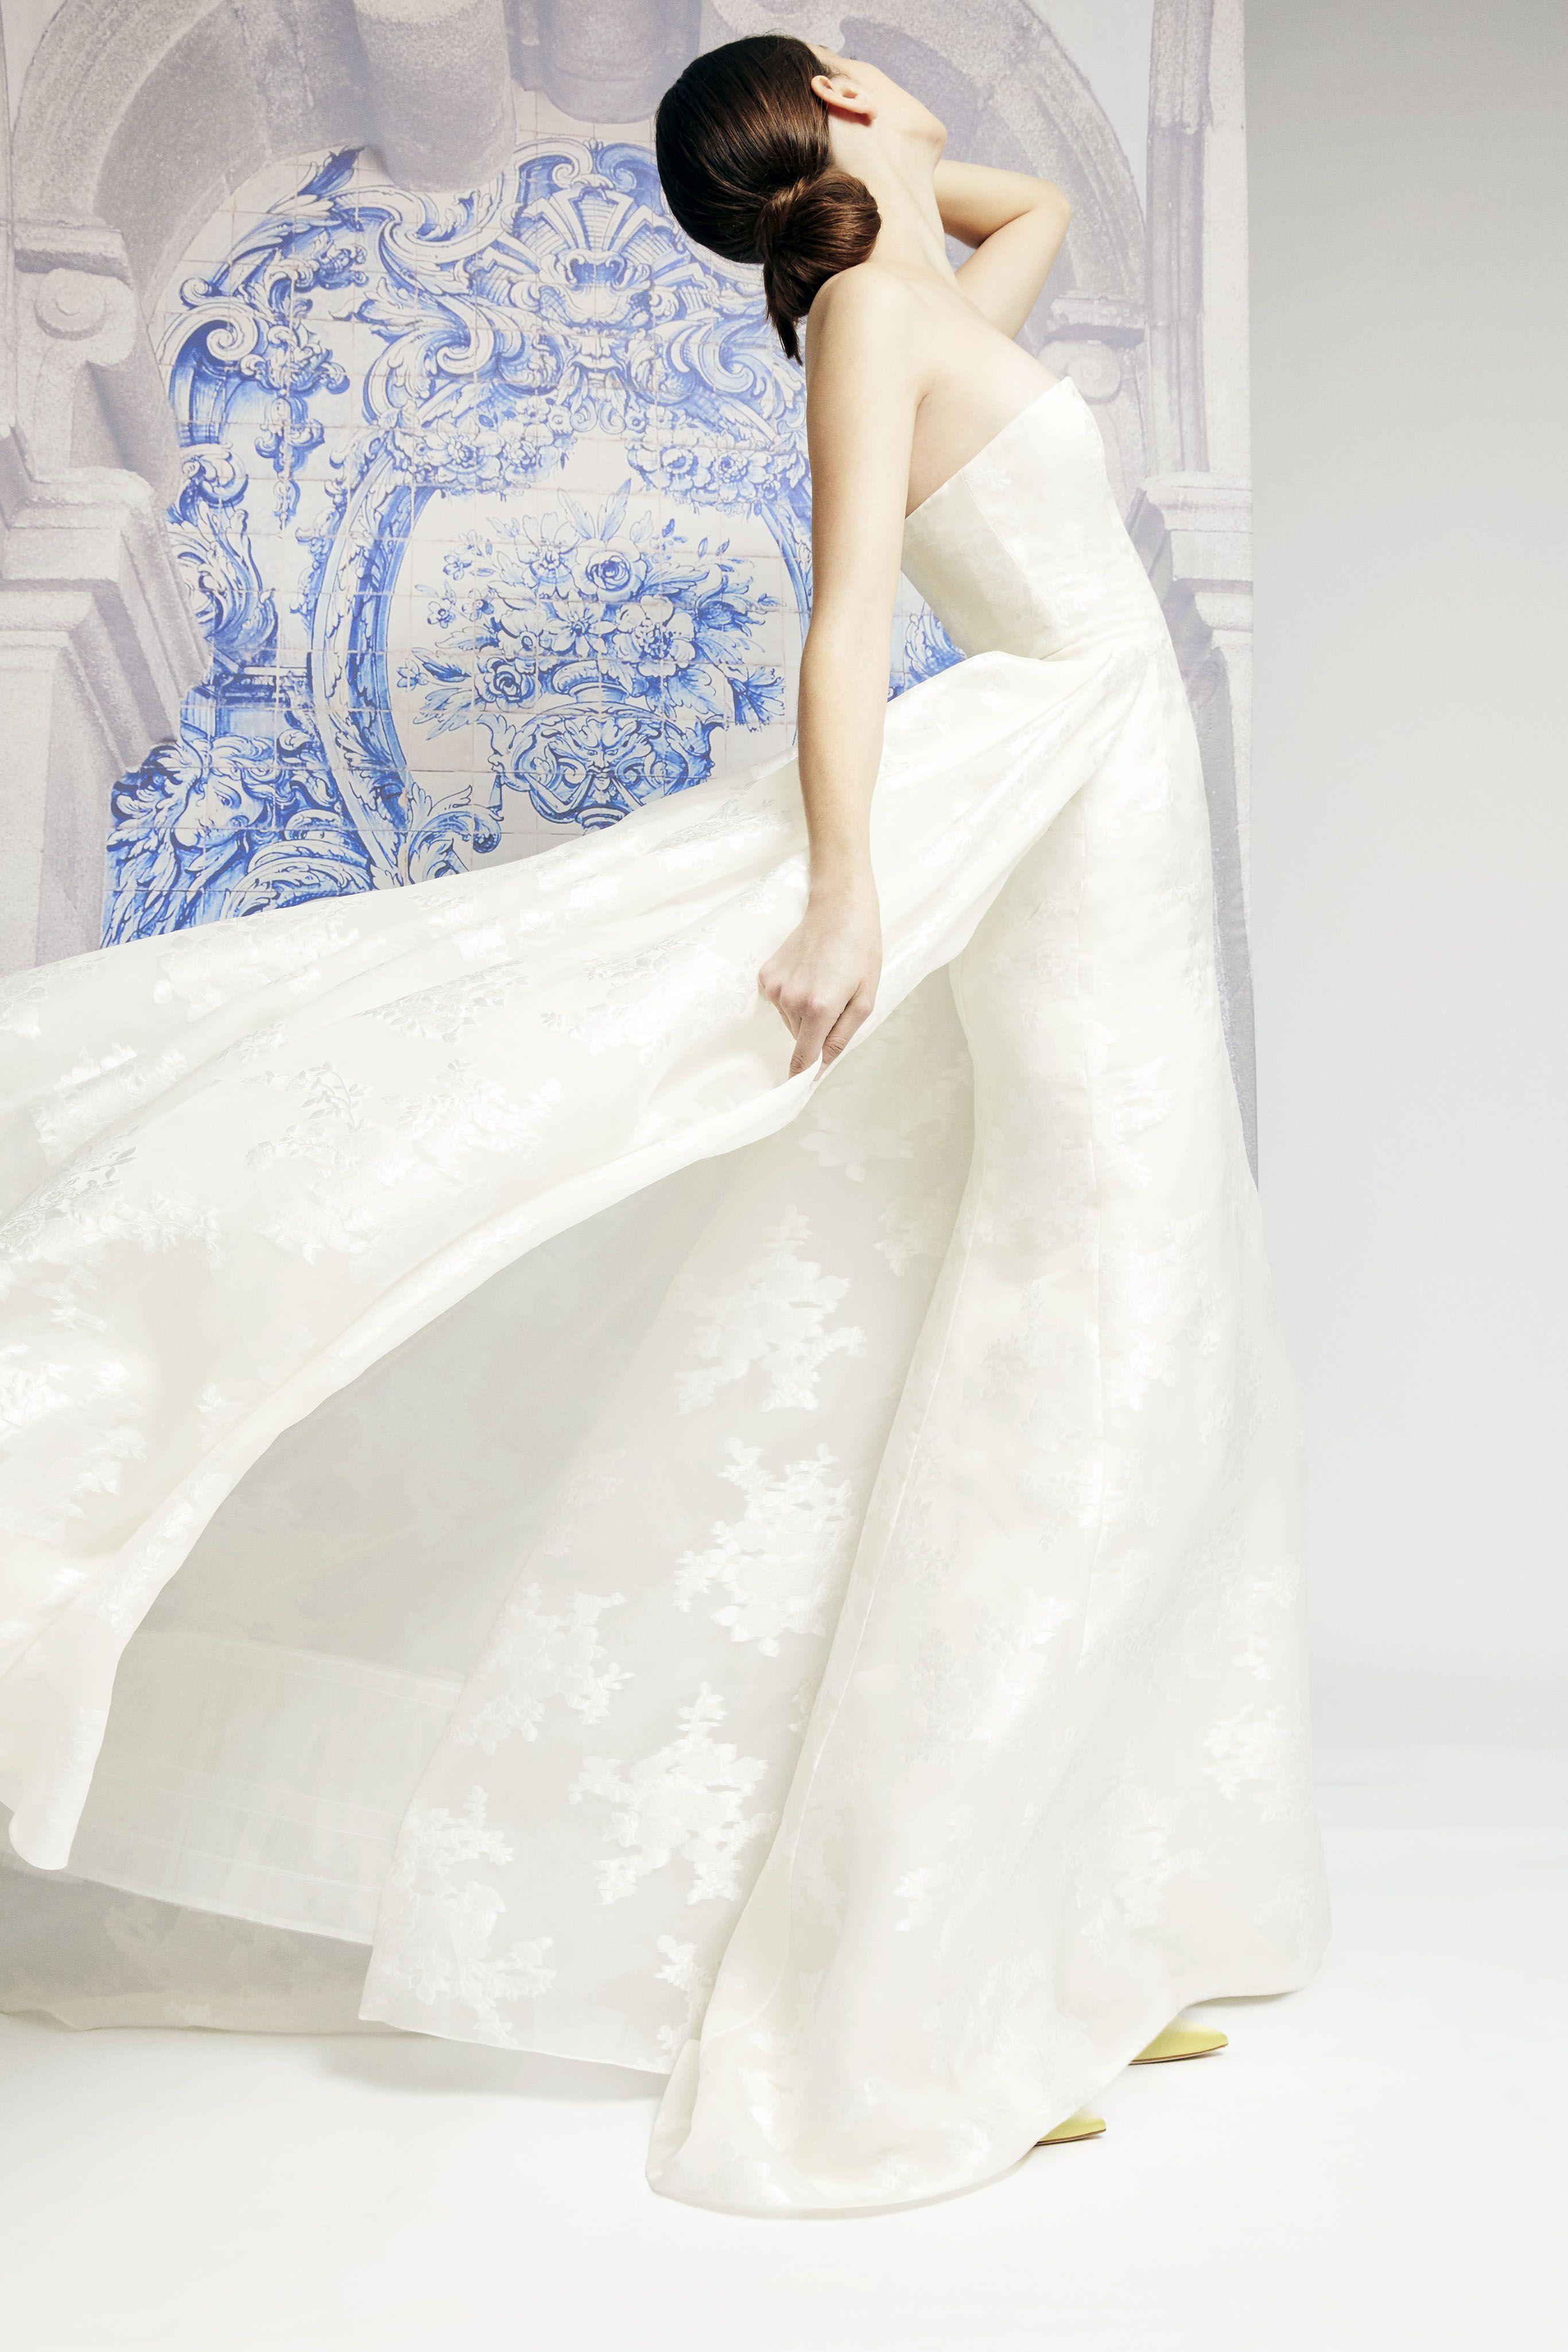 80+ Best Wedding Dresses Fall 2019 - Top Autumn Bridal Runway Looks 2c00339e9d6